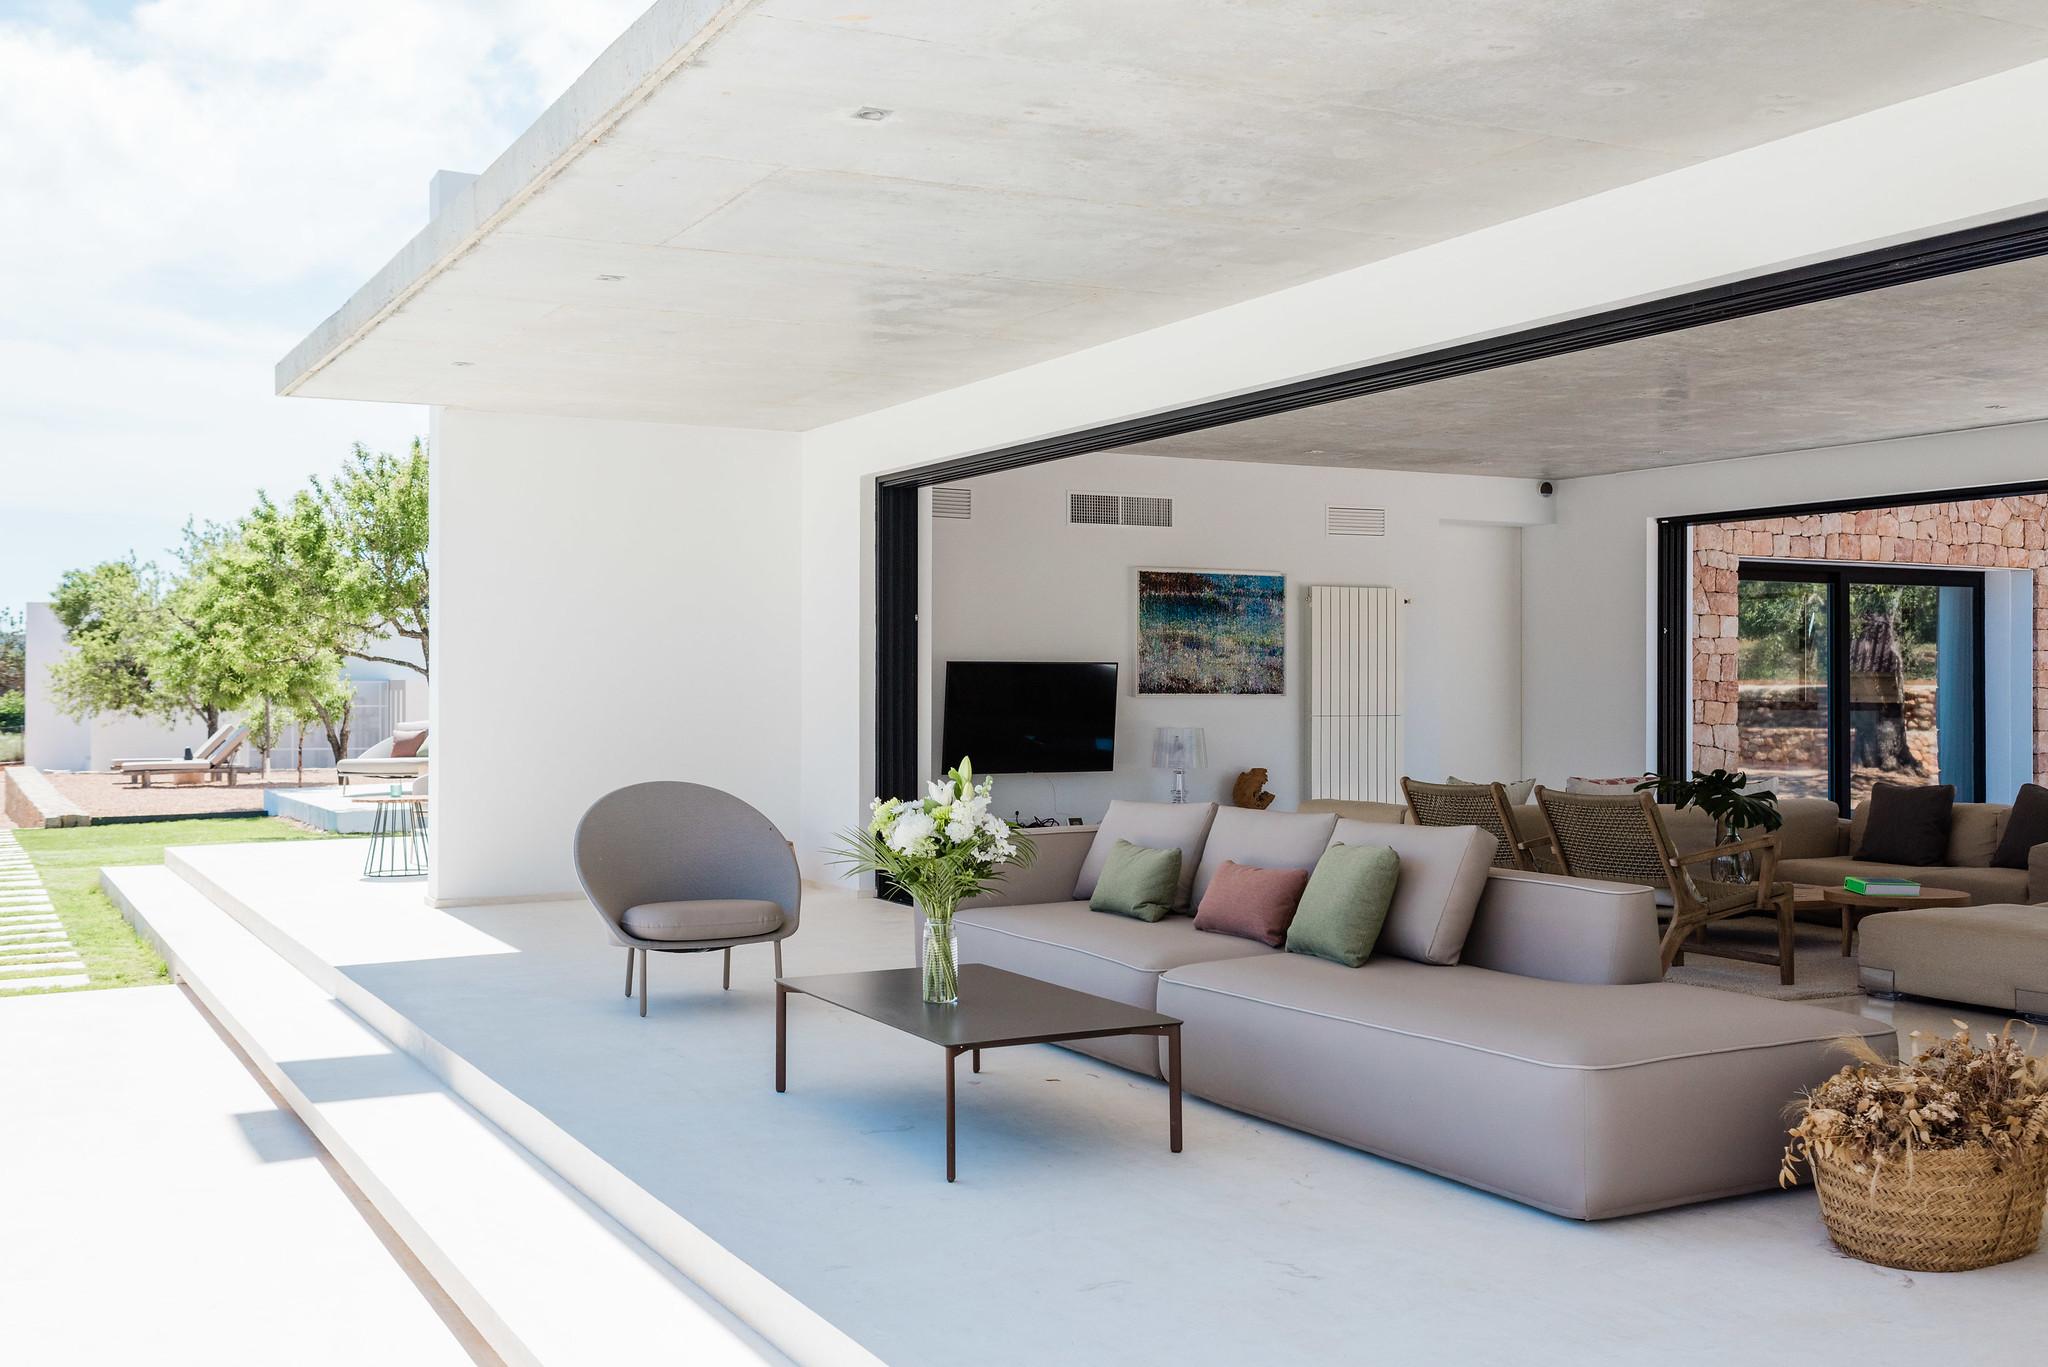 https://www.white-ibiza.com/wp-content/uploads/2020/06/white-ibiza-villas-can-carmen-exterior-outside-in.jpg